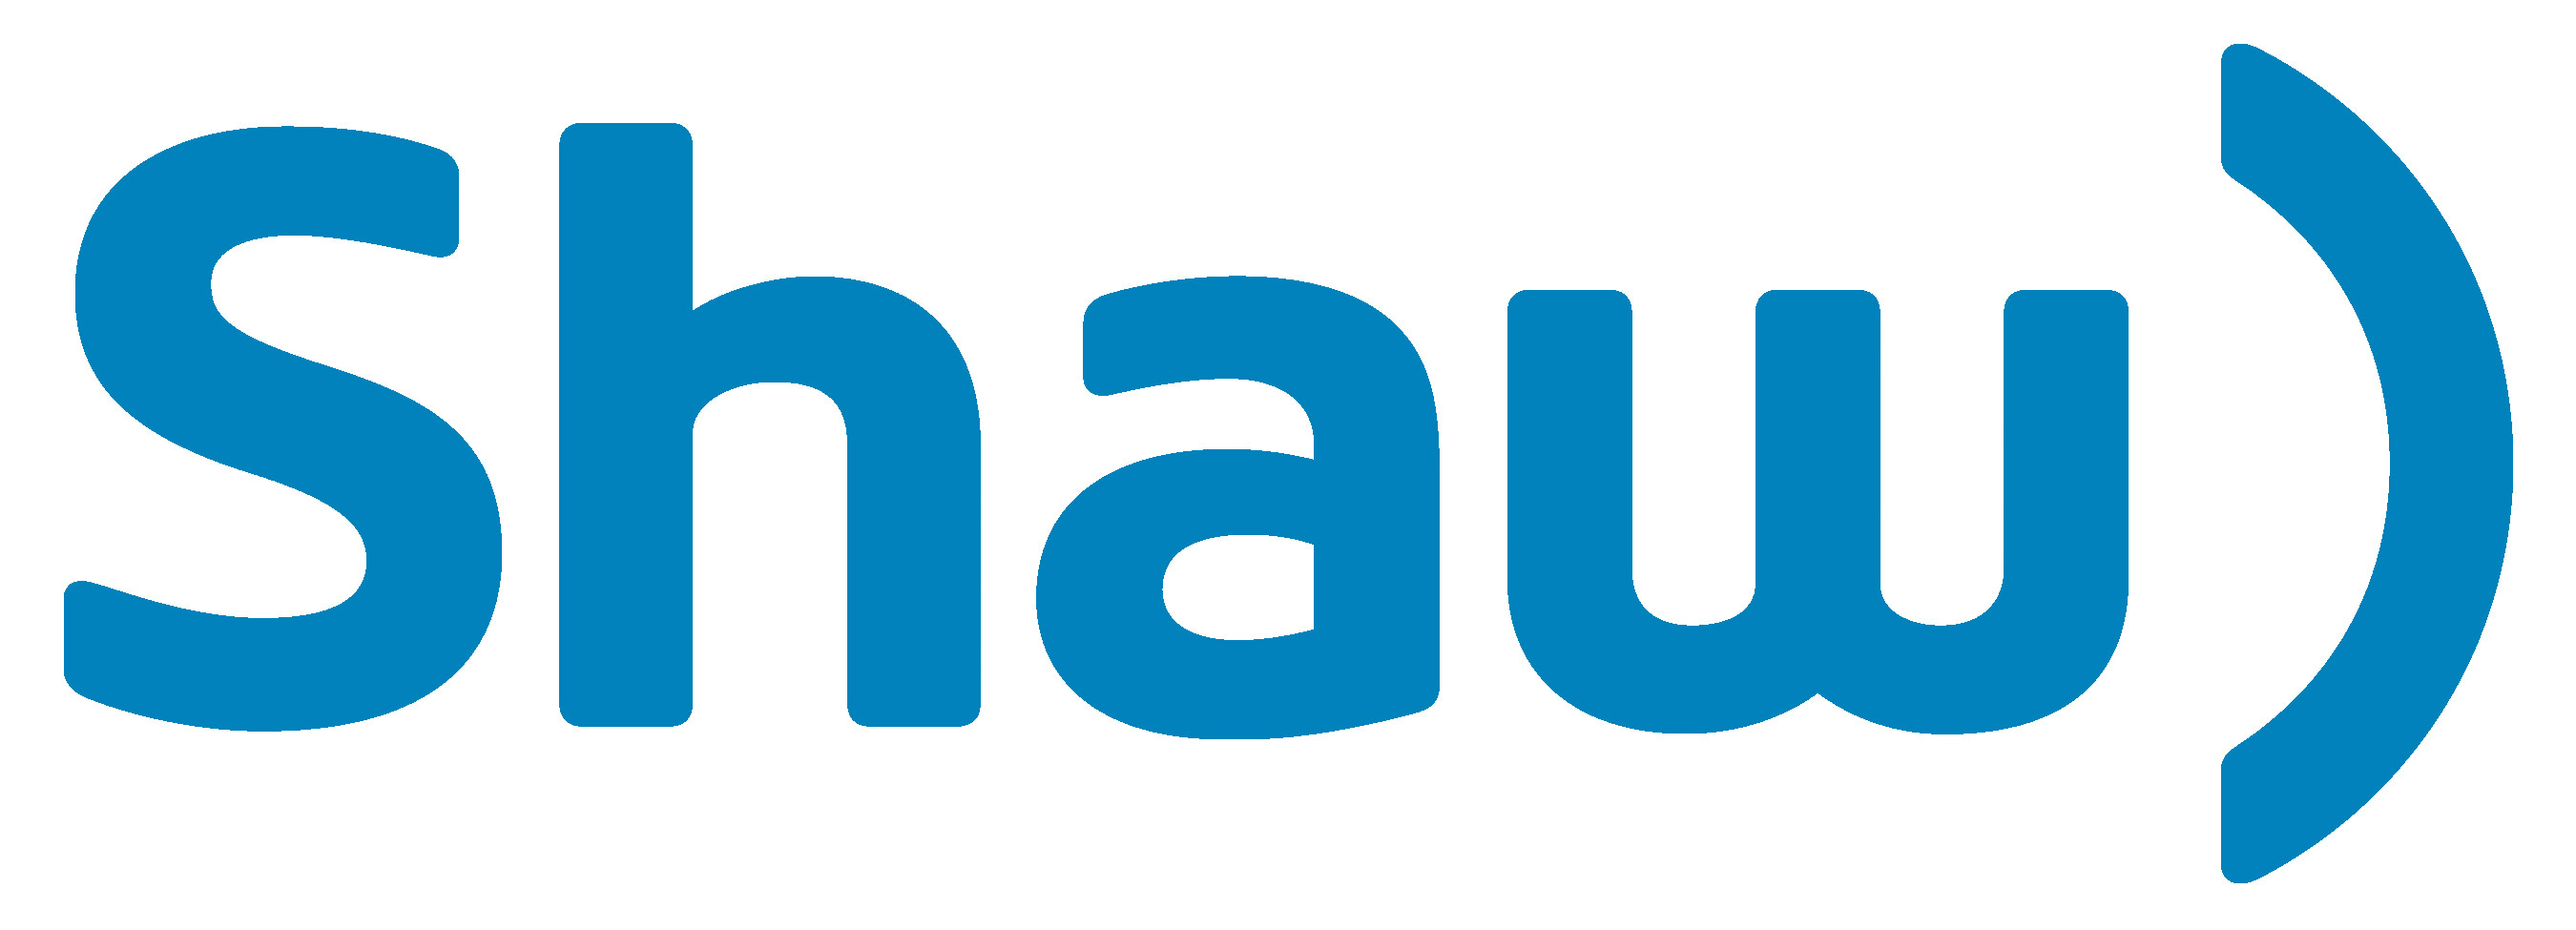 Shaw Communications Logo photo - 1